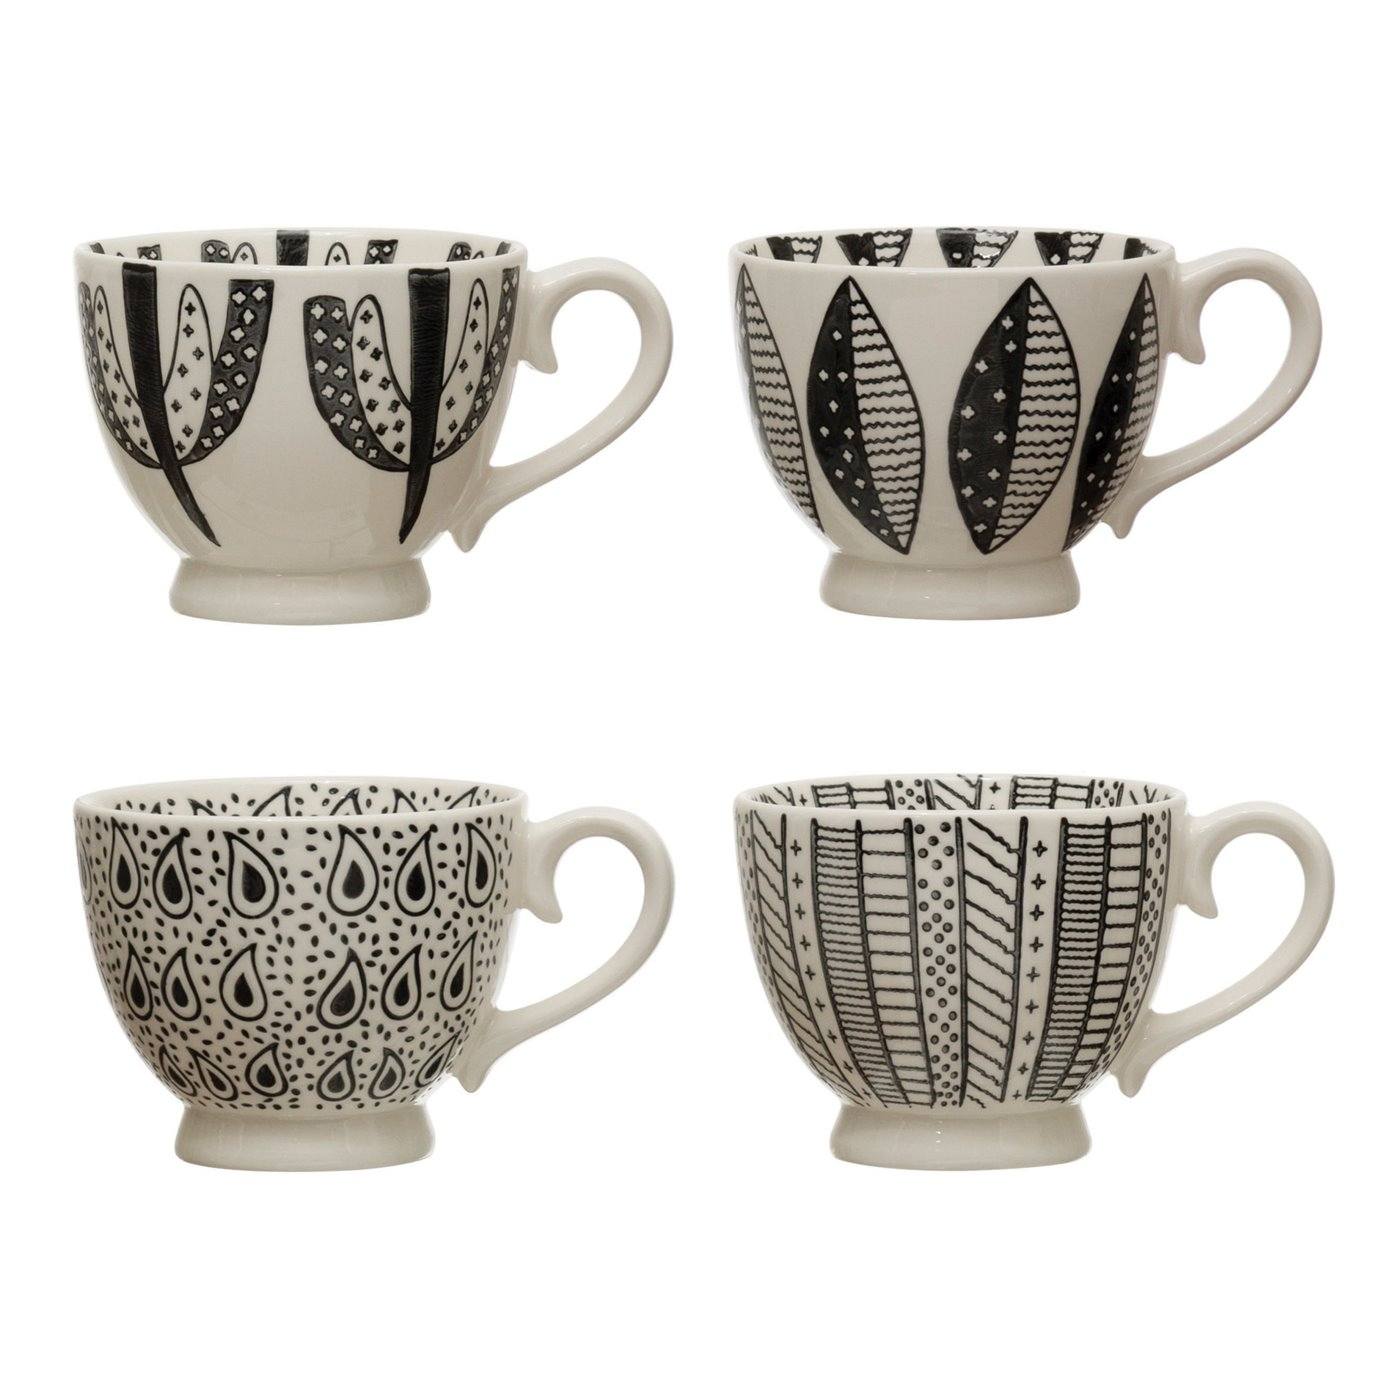 16 oz. Stoneware Mug w/ Pattern, Black & White, 4 Styles